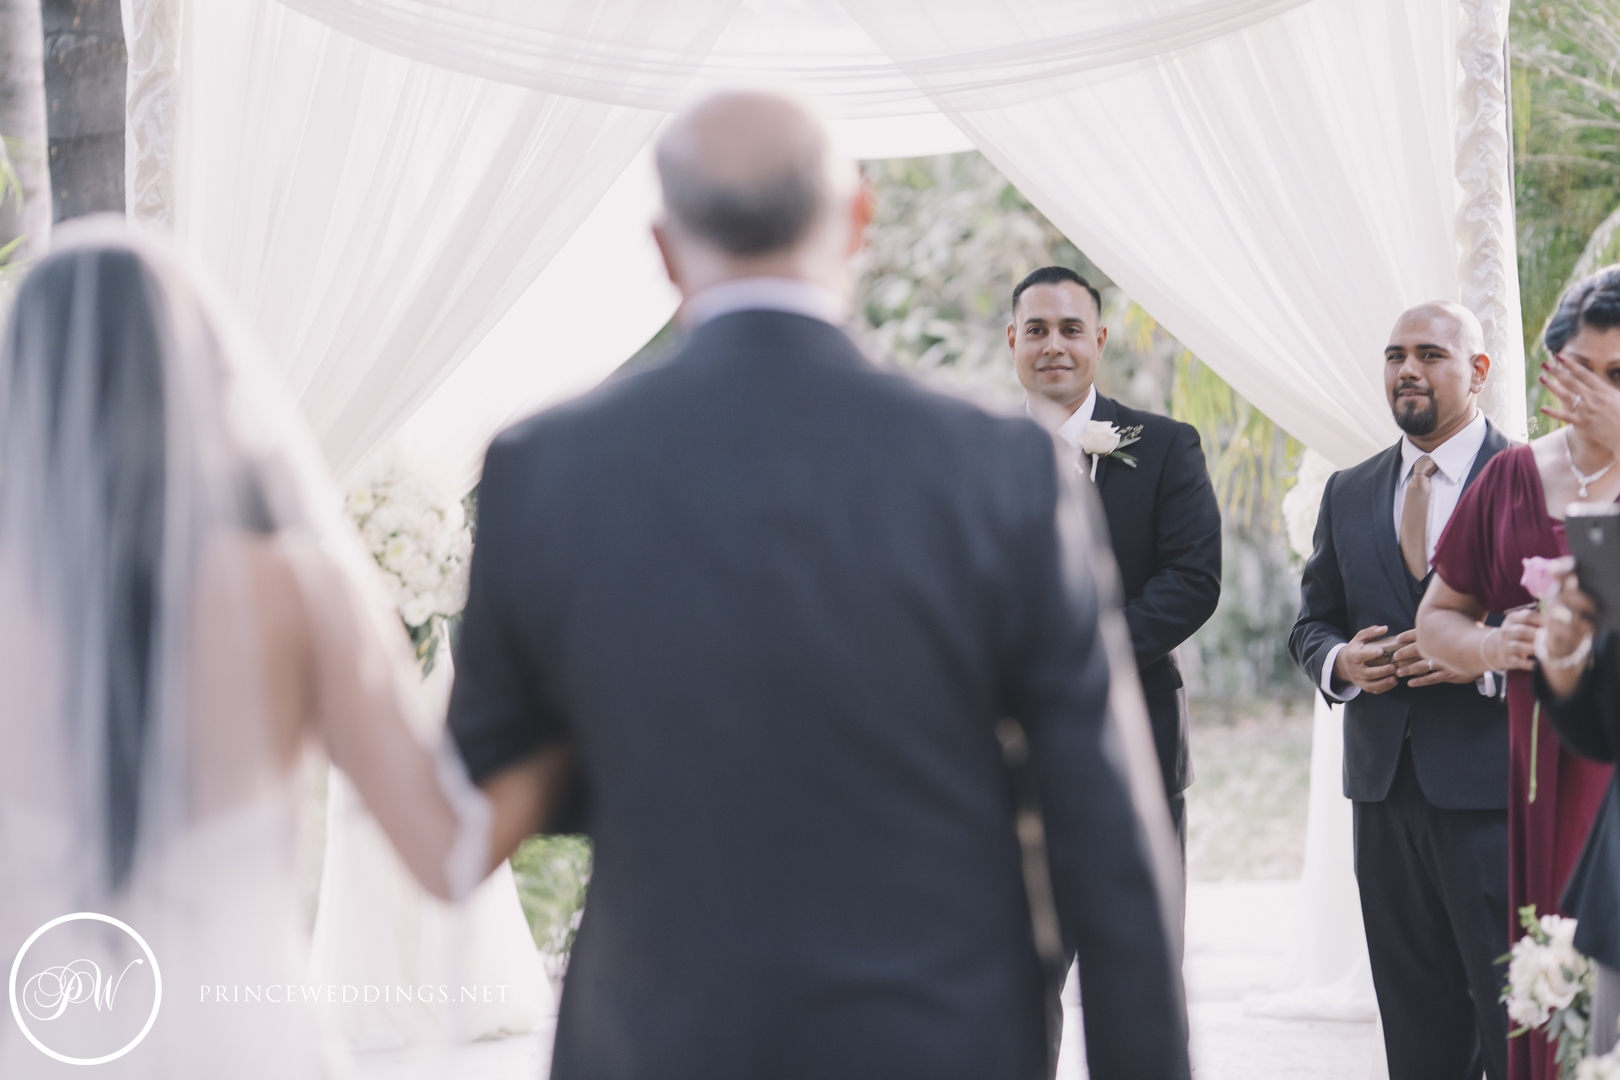 Los Angeles River Center & Gardens Wedding Photos-270.jpg